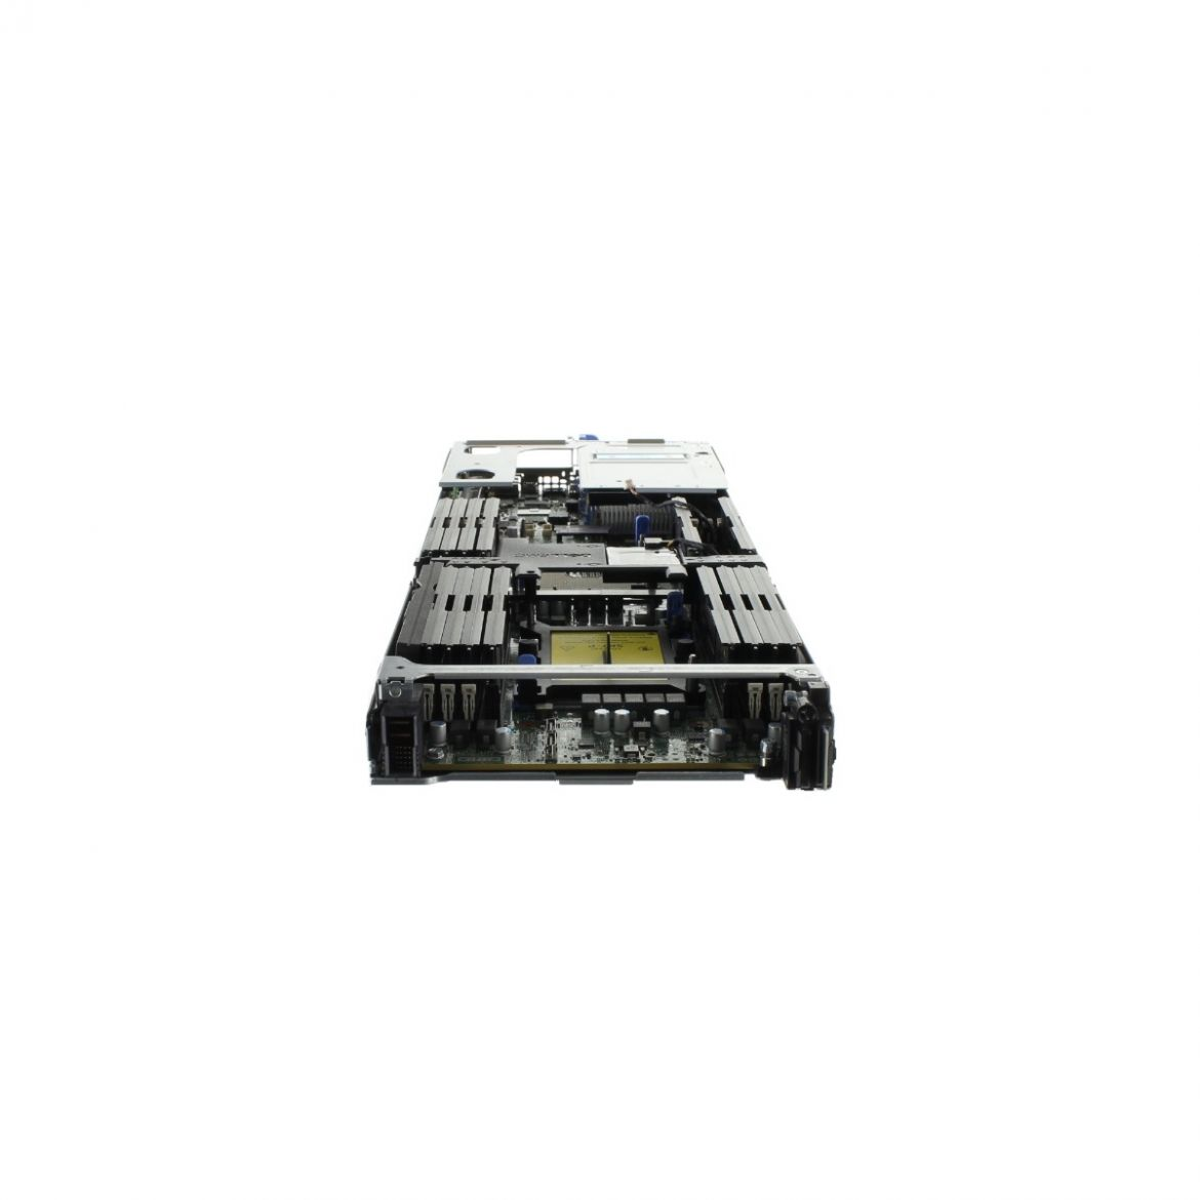 Dell PowerEdge C6420 2 x 8 Core 2.10GHz Silver 4208 64GB DDR4 RAM Dual Port 10GB NIC